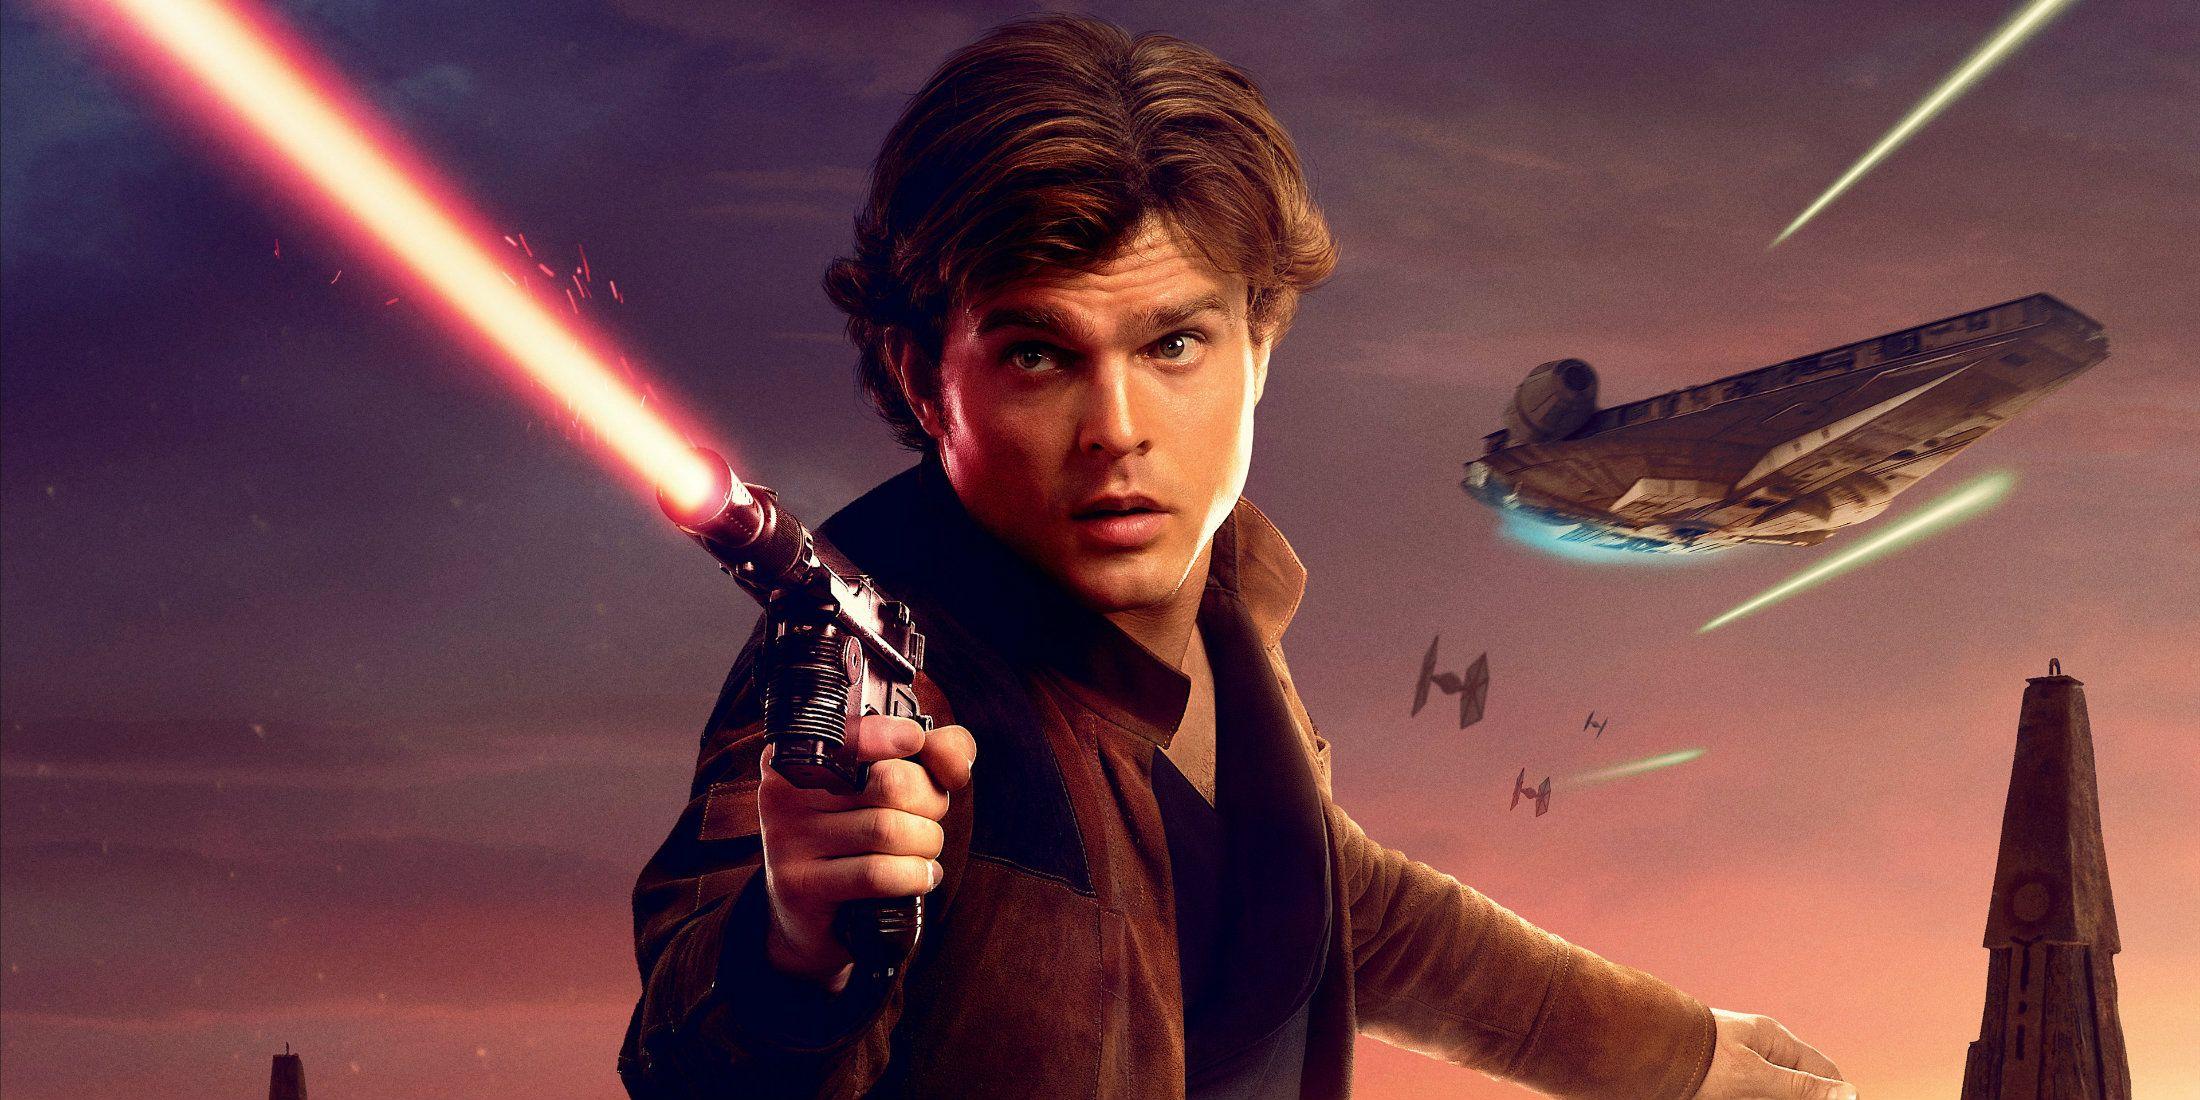 Star Wars: Solo Writer Blames Disney for Box Office Failure